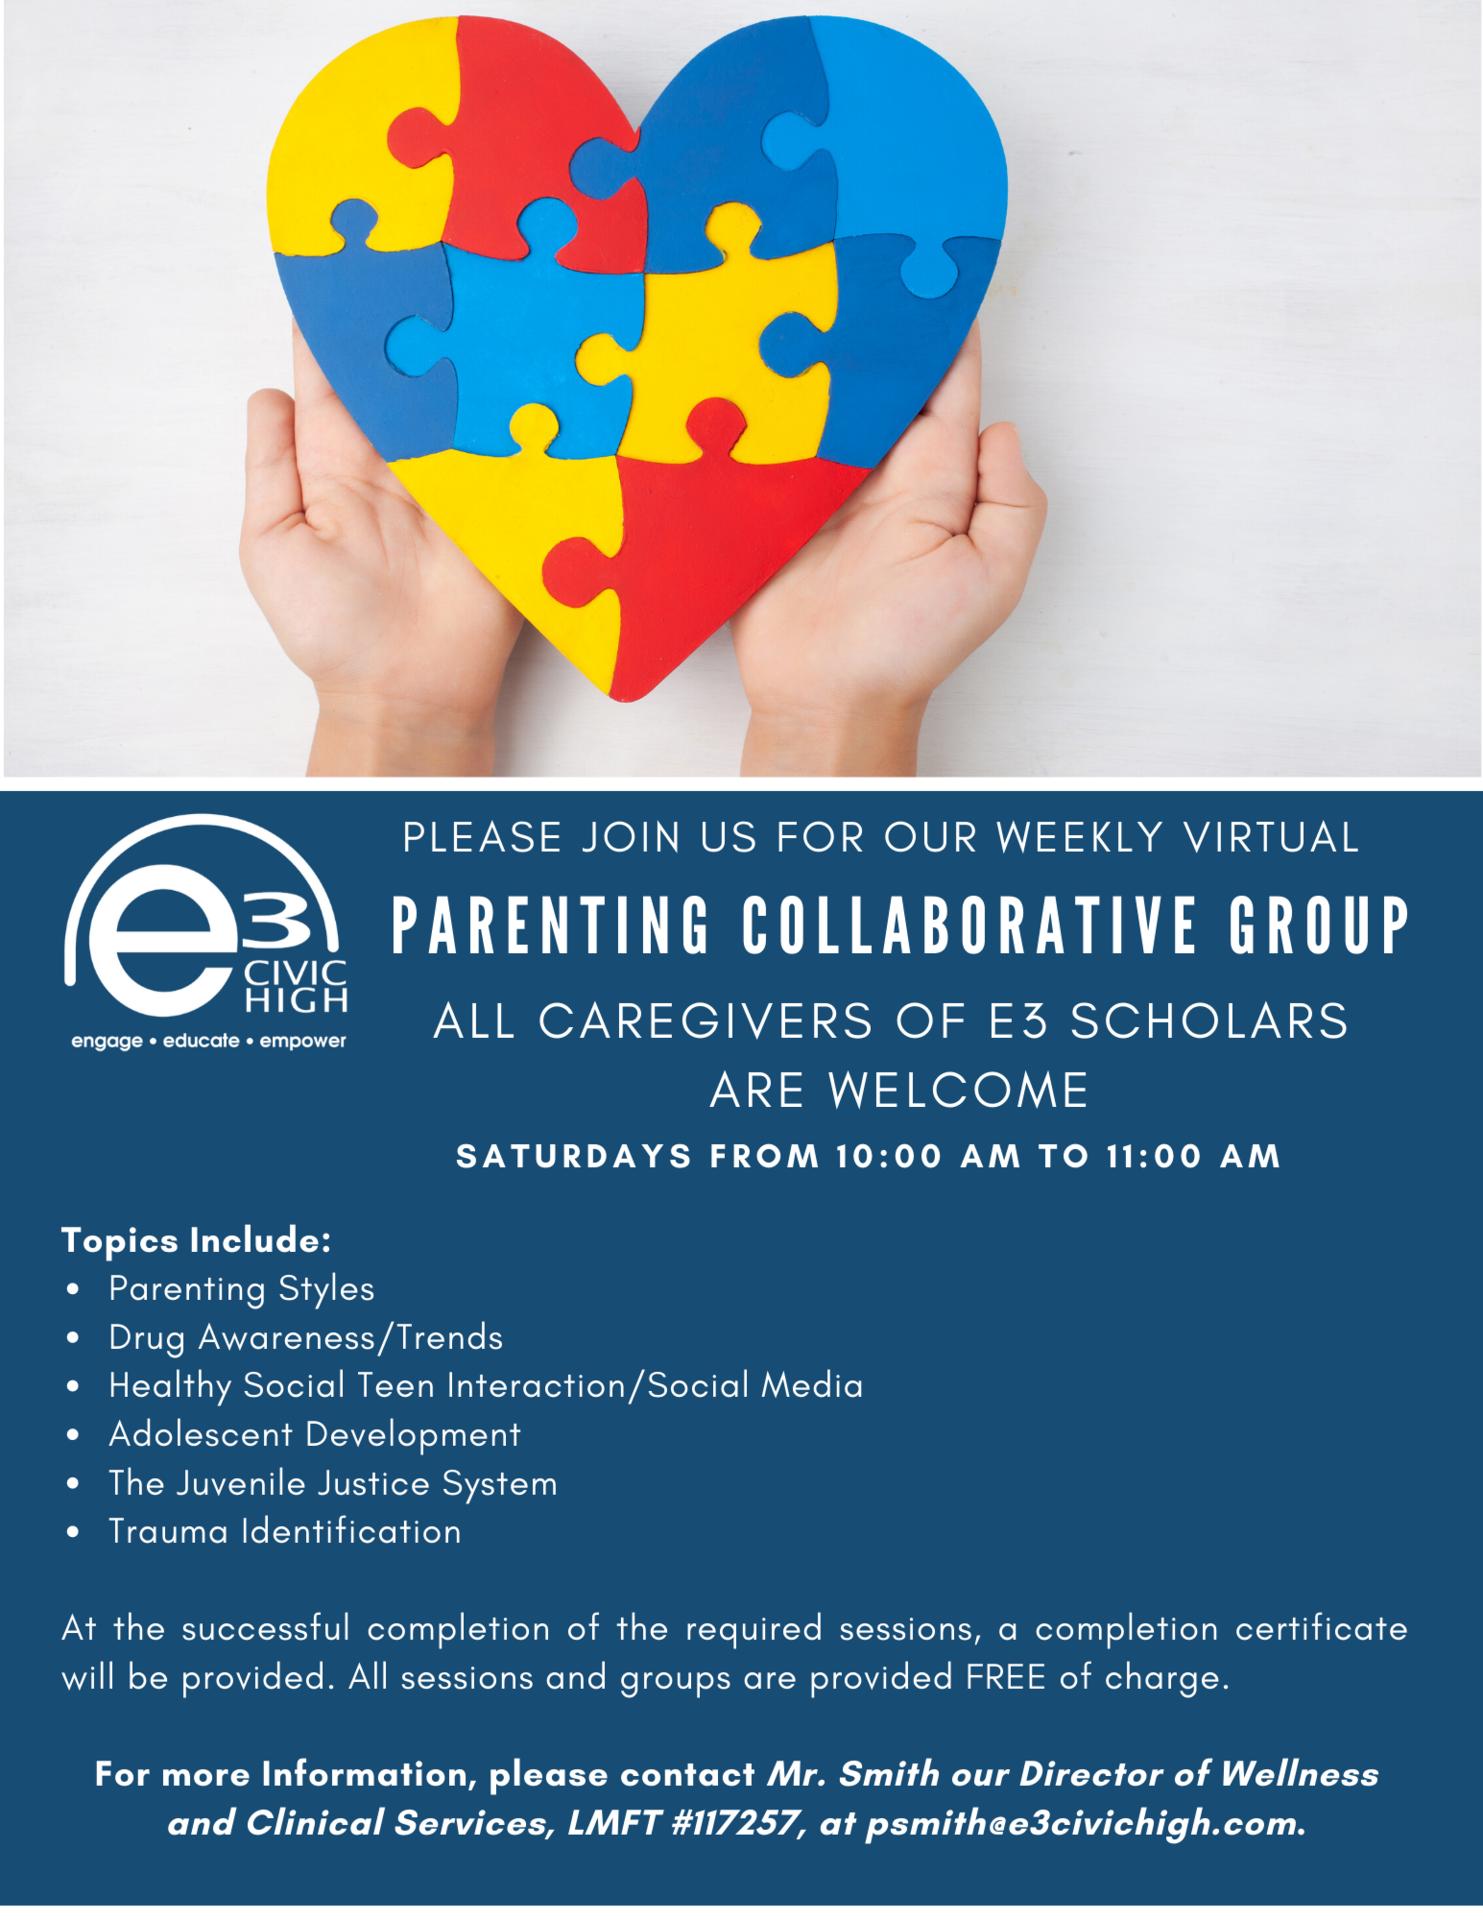 Parenting Collaborative